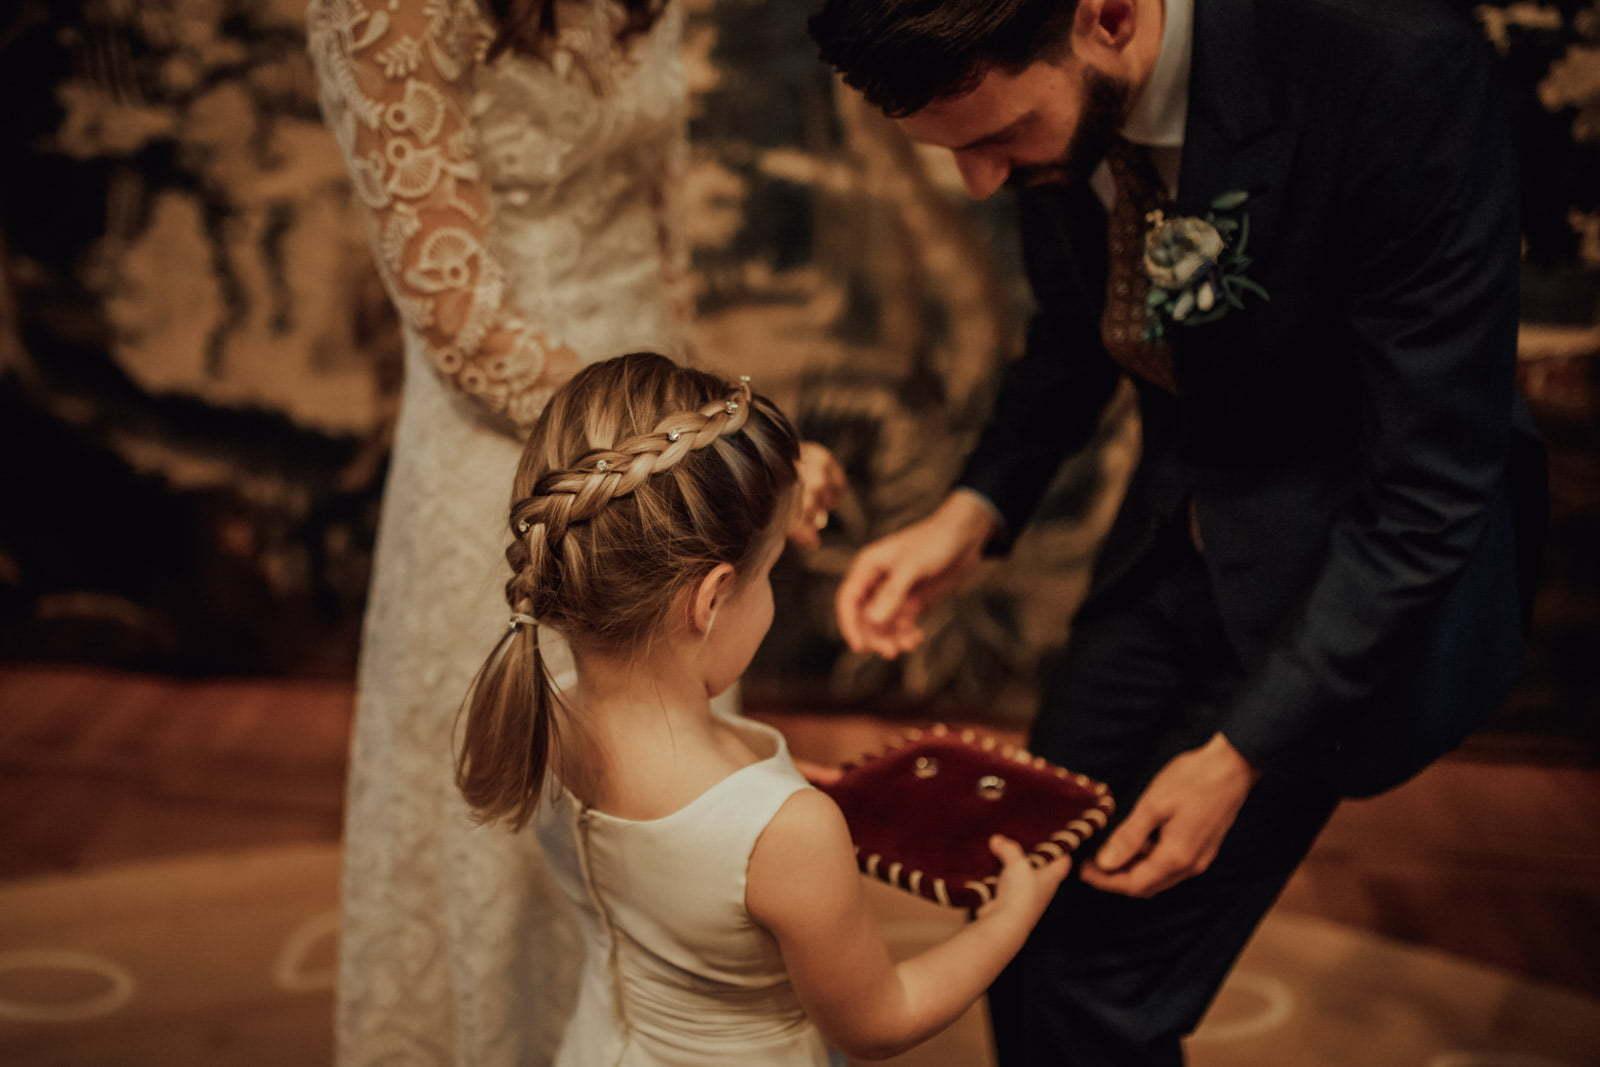 winter-bruiloft-winterbruiloft-fotograaf-bruidsfotograaf-54